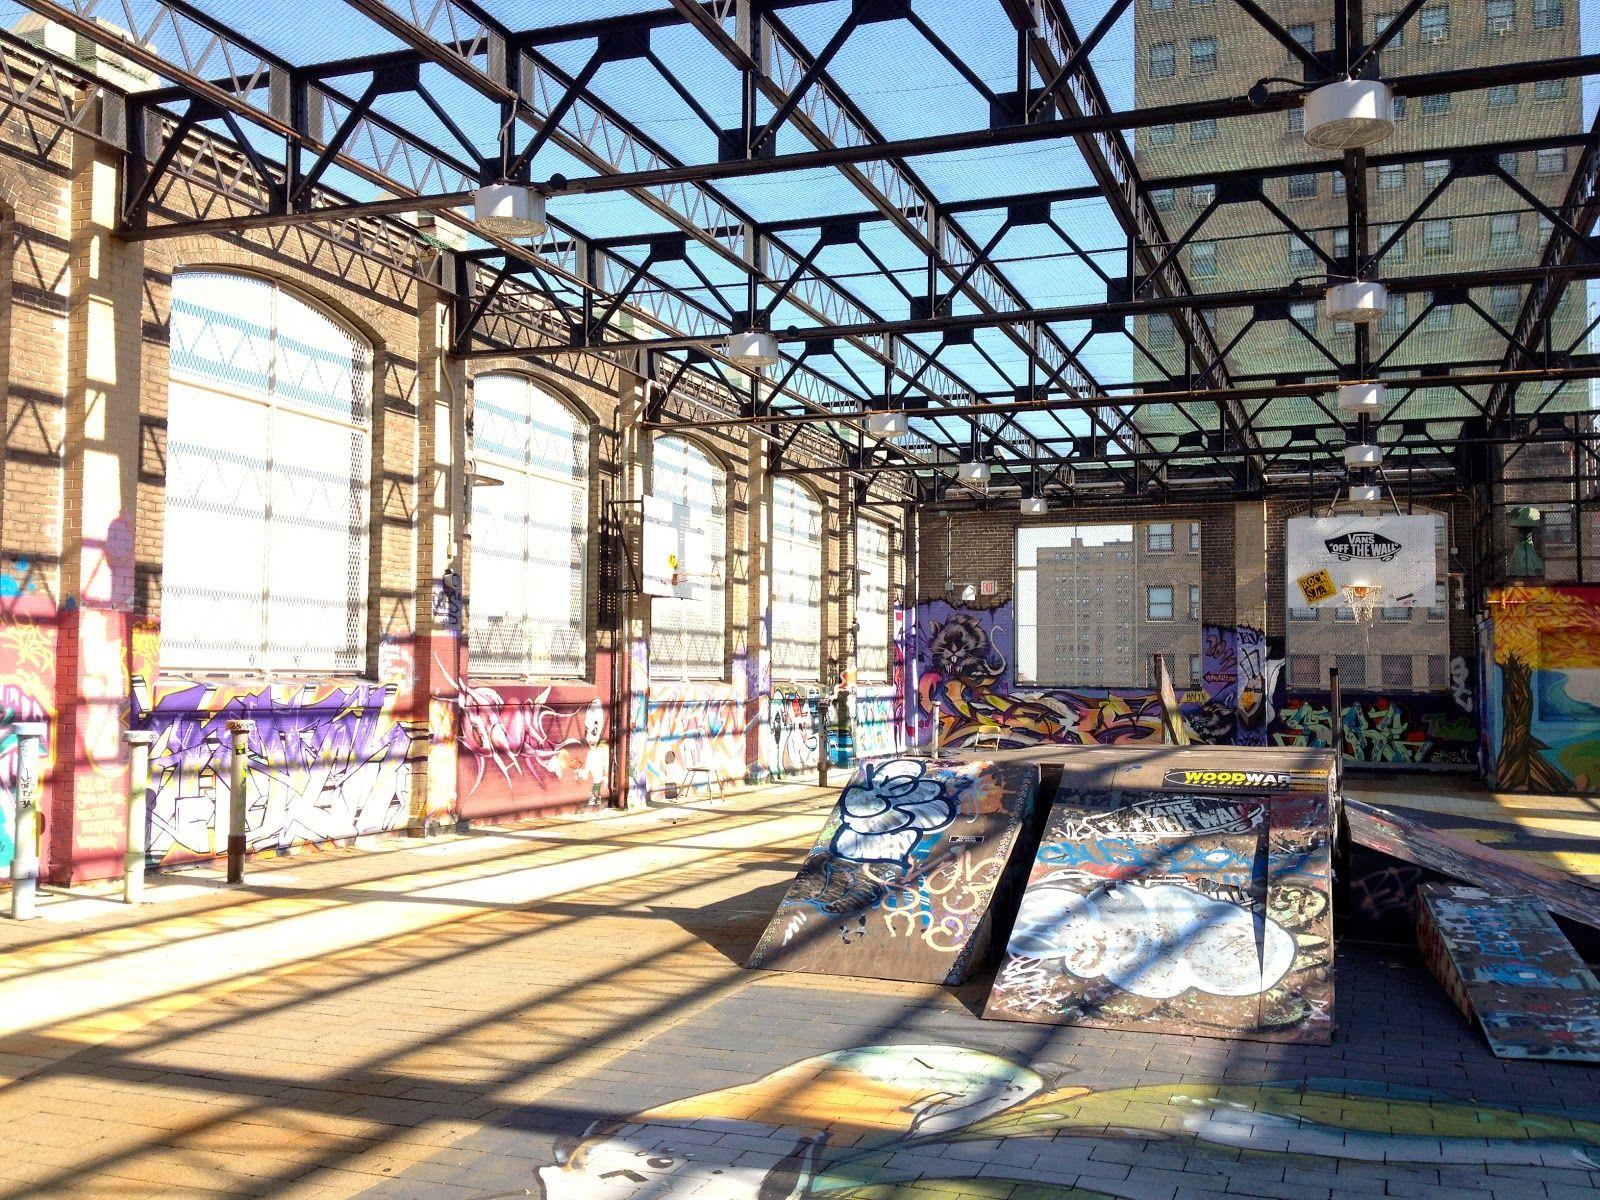 Google image result for http image spreadshirt com image server v1 - Essex St Academy Rooftop Skatepark And Graffiti